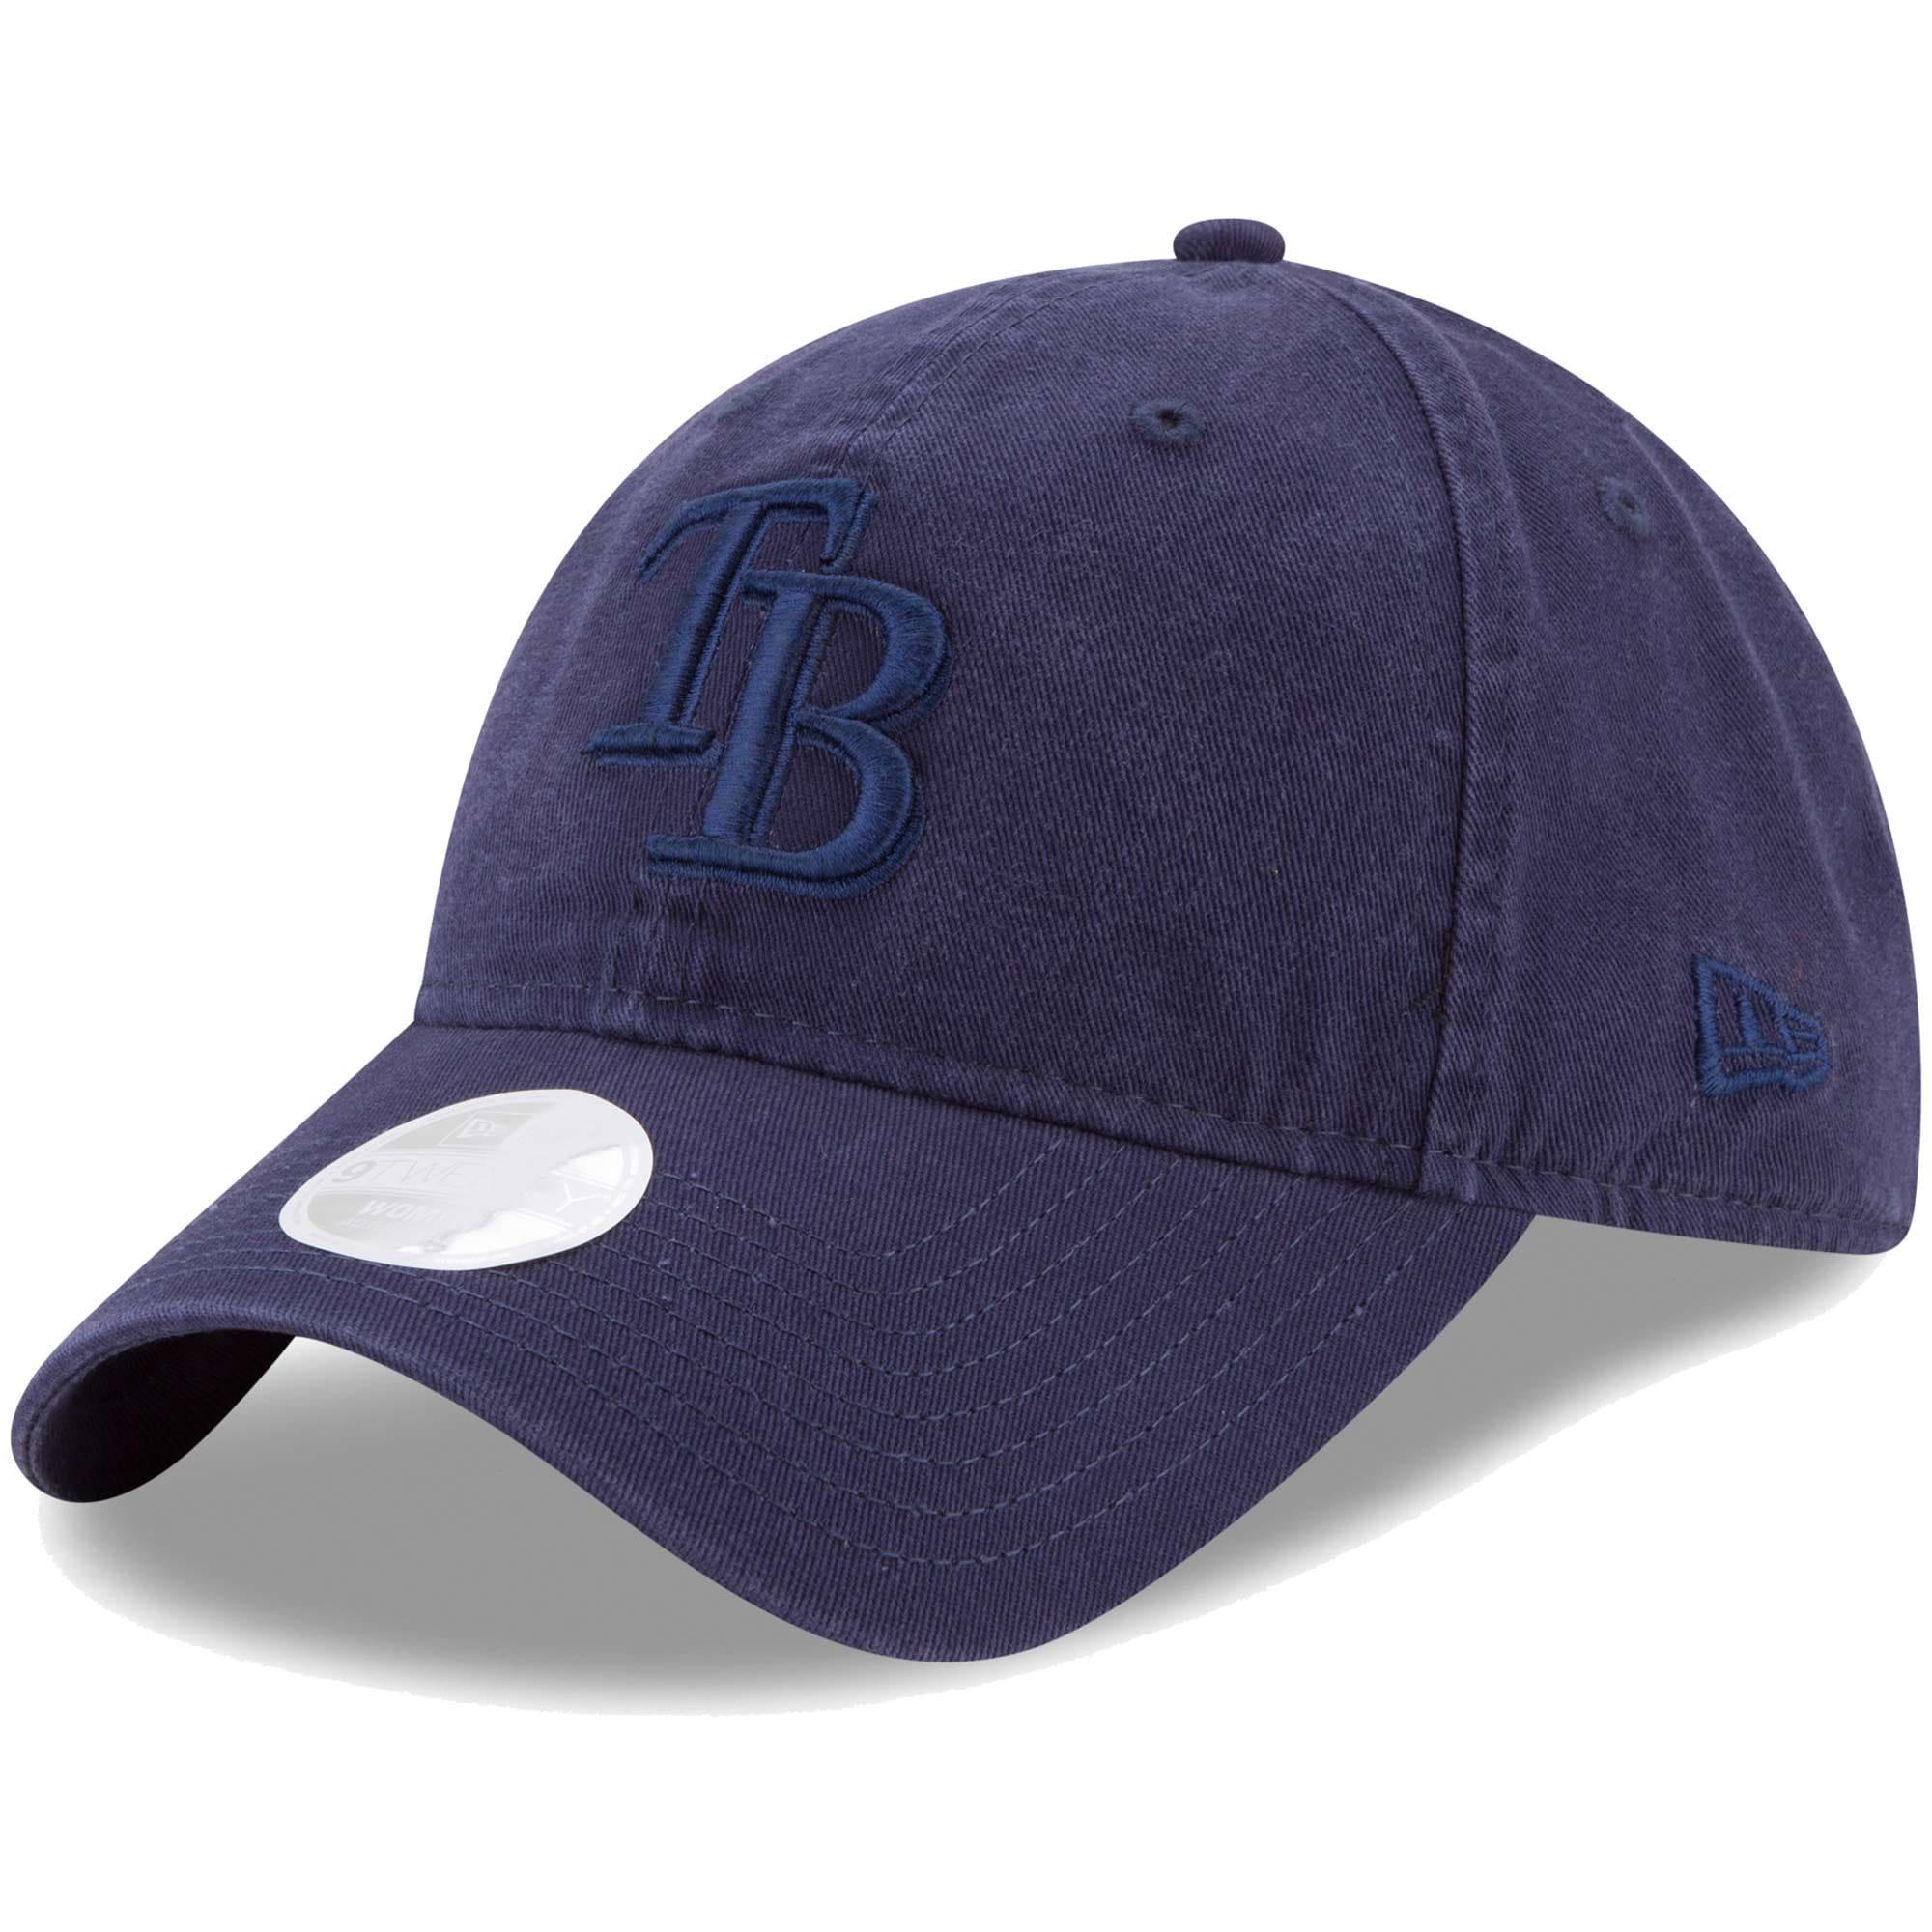 Tampa Bay Rays New Era Women's Preferred Pick Tonal 9TWENTY Adjustable Hat - Navy